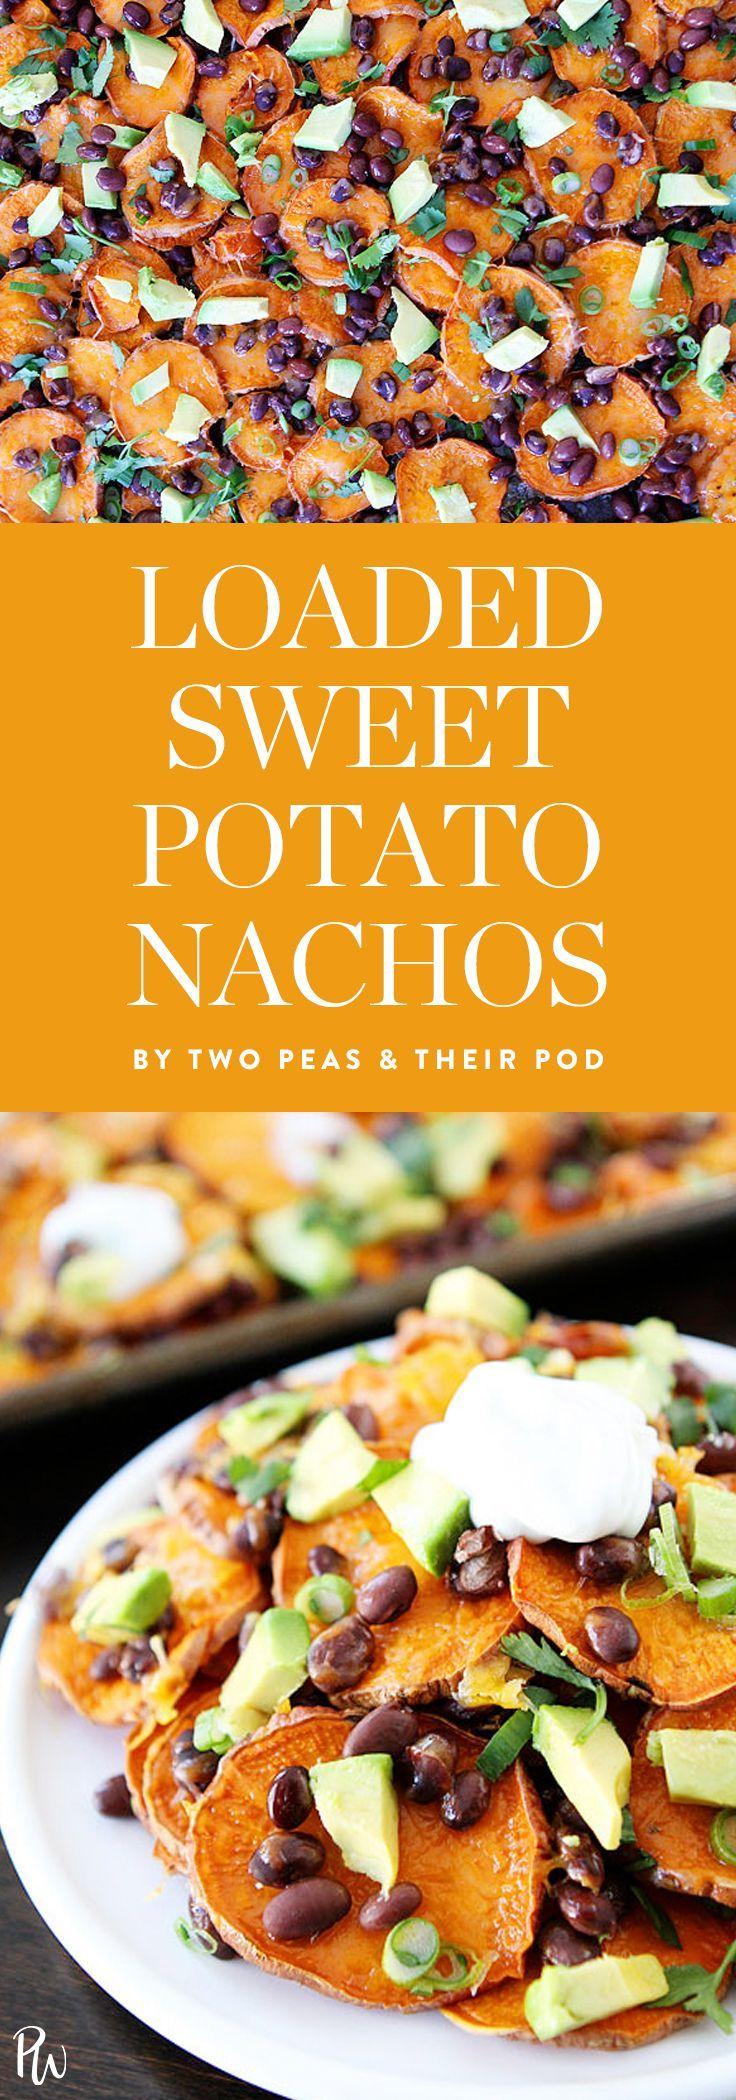 Best 25+ Sweet potato nachos ideas on Pinterest | Paleo nachos, Paleo grubs and Award winning ...